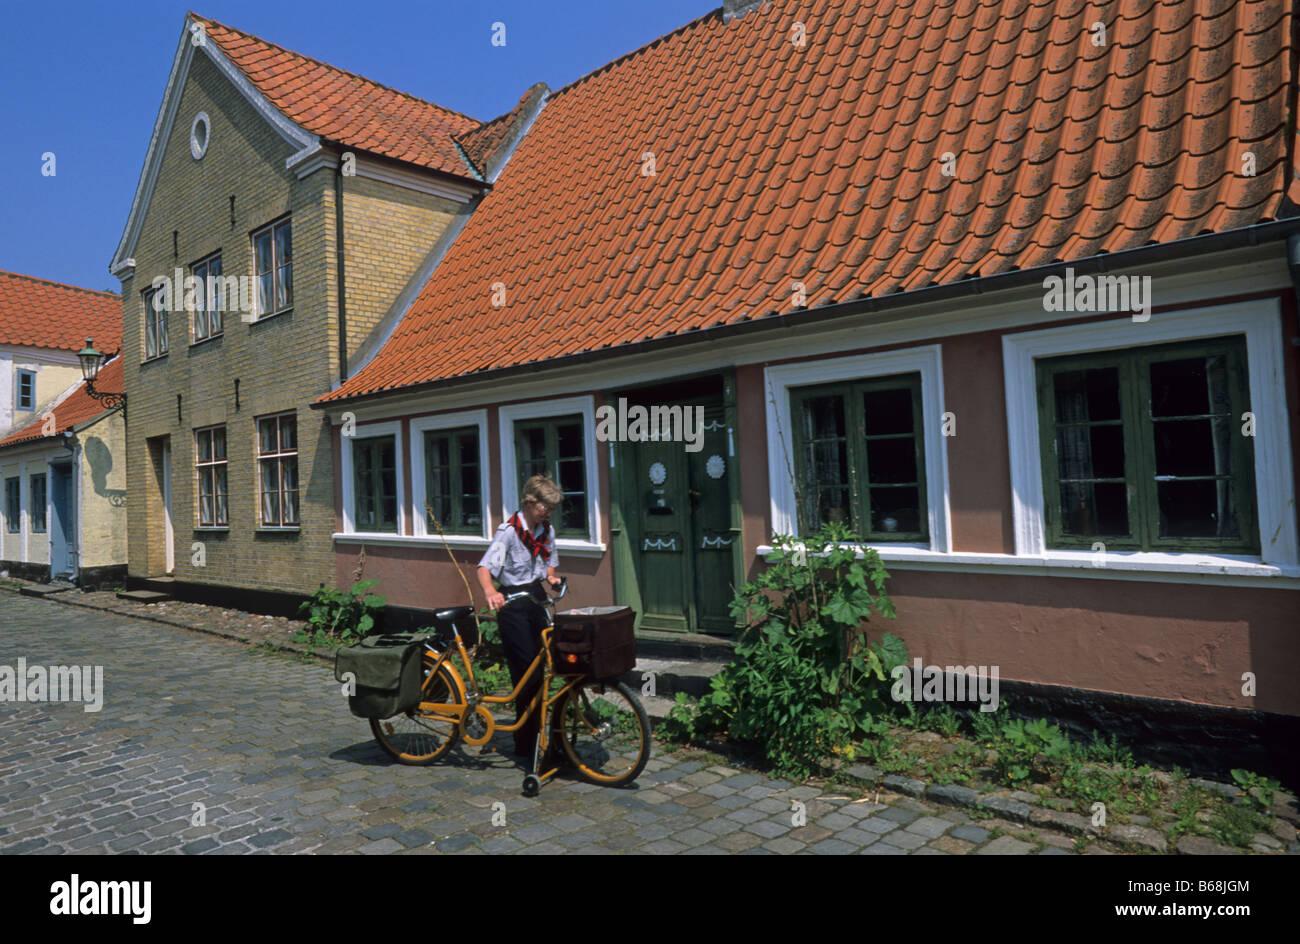 Elk167 2998 Denmark Aero Island Aeroskobing postwoman on her bicycle - Stock Image